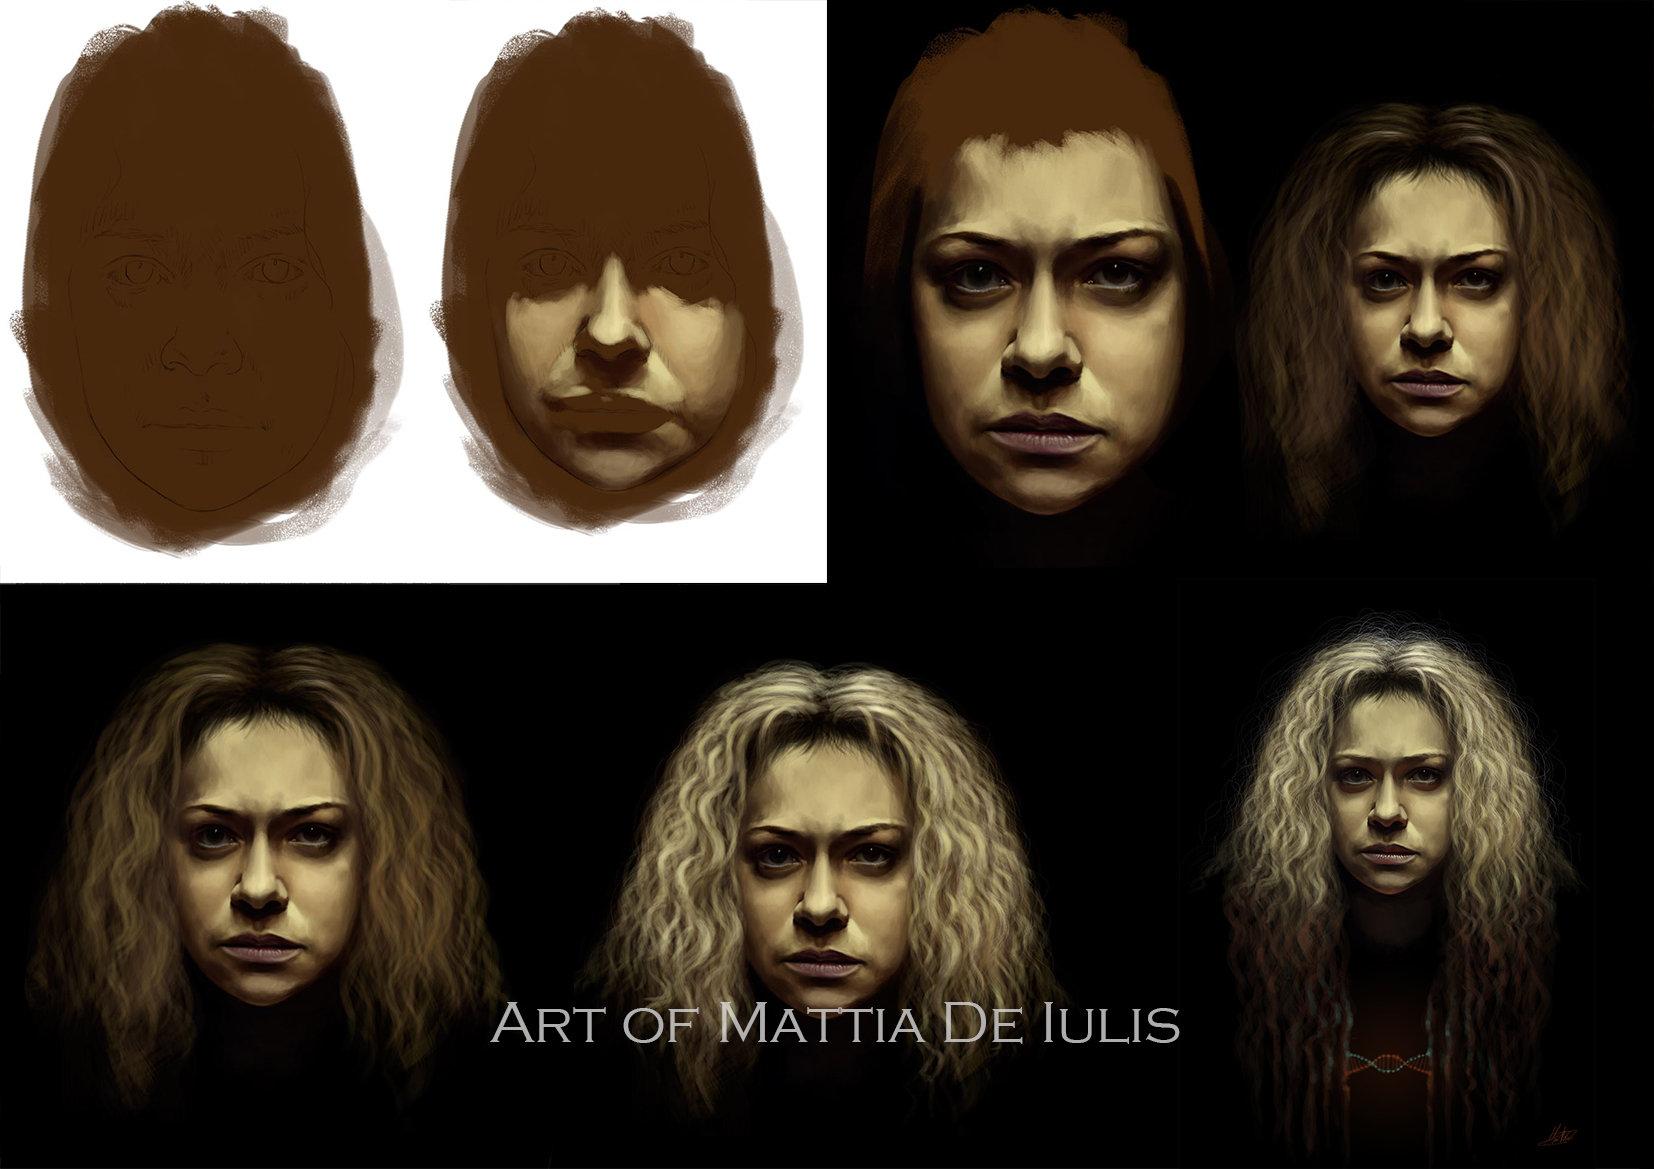 Mattia de iulis step tutorial